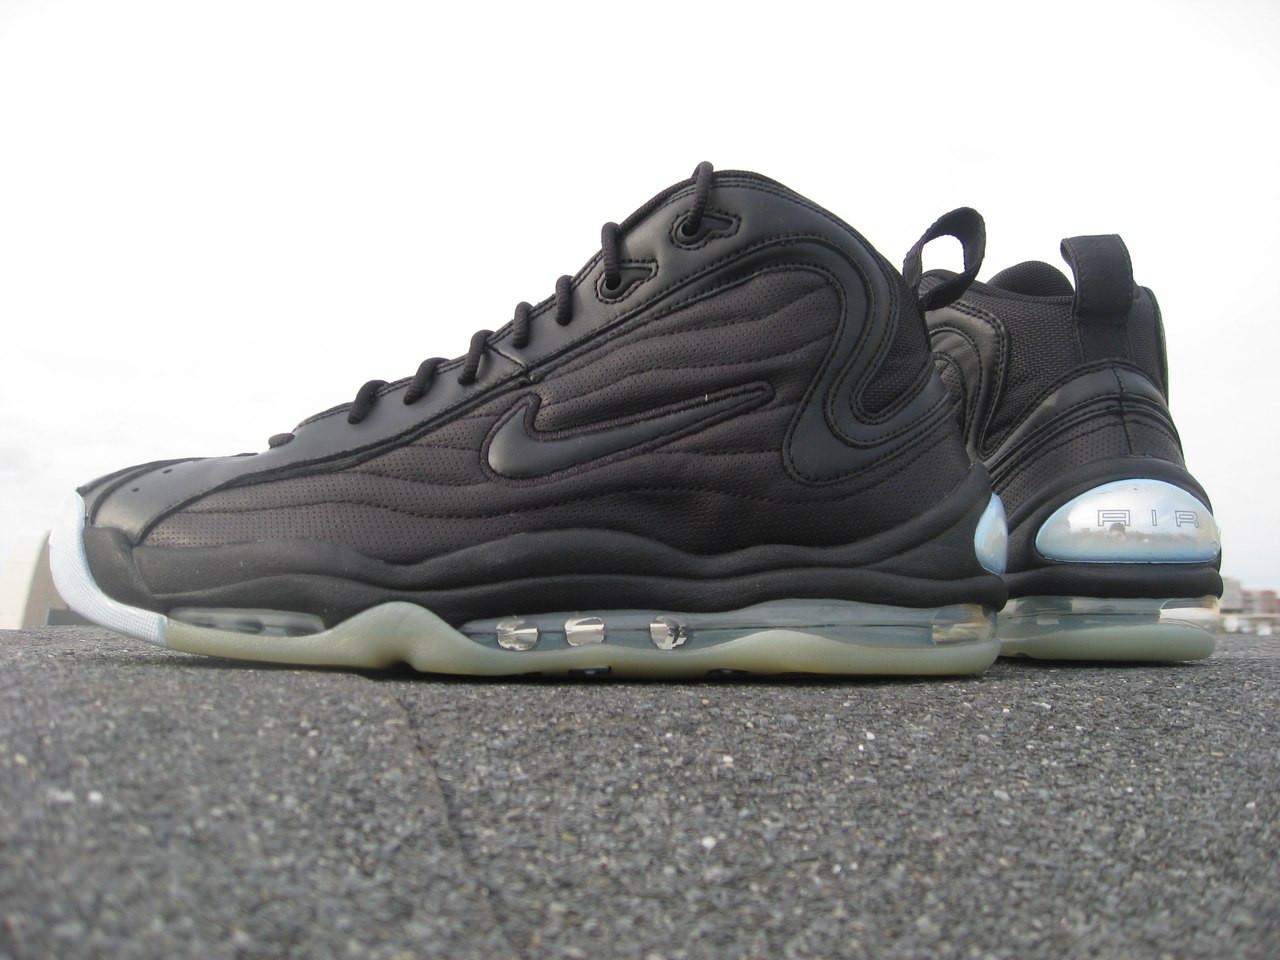 148181d1 Баскетбольные кроссовки Nike Air Total Max Uptempo